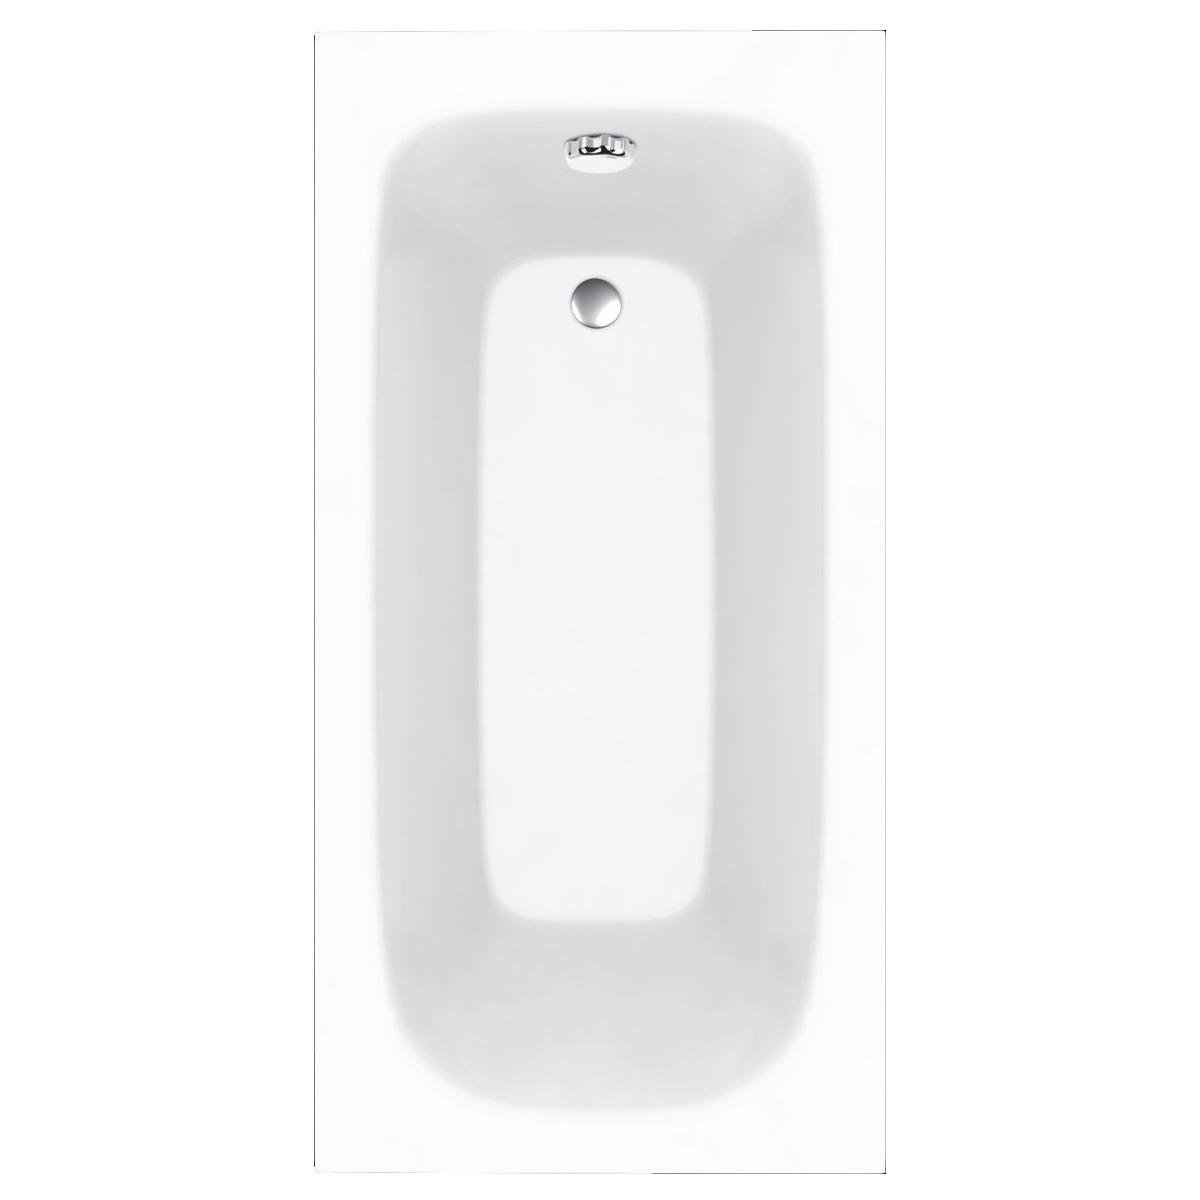 K-Vit G4K 1600 x 700 Contract Bath